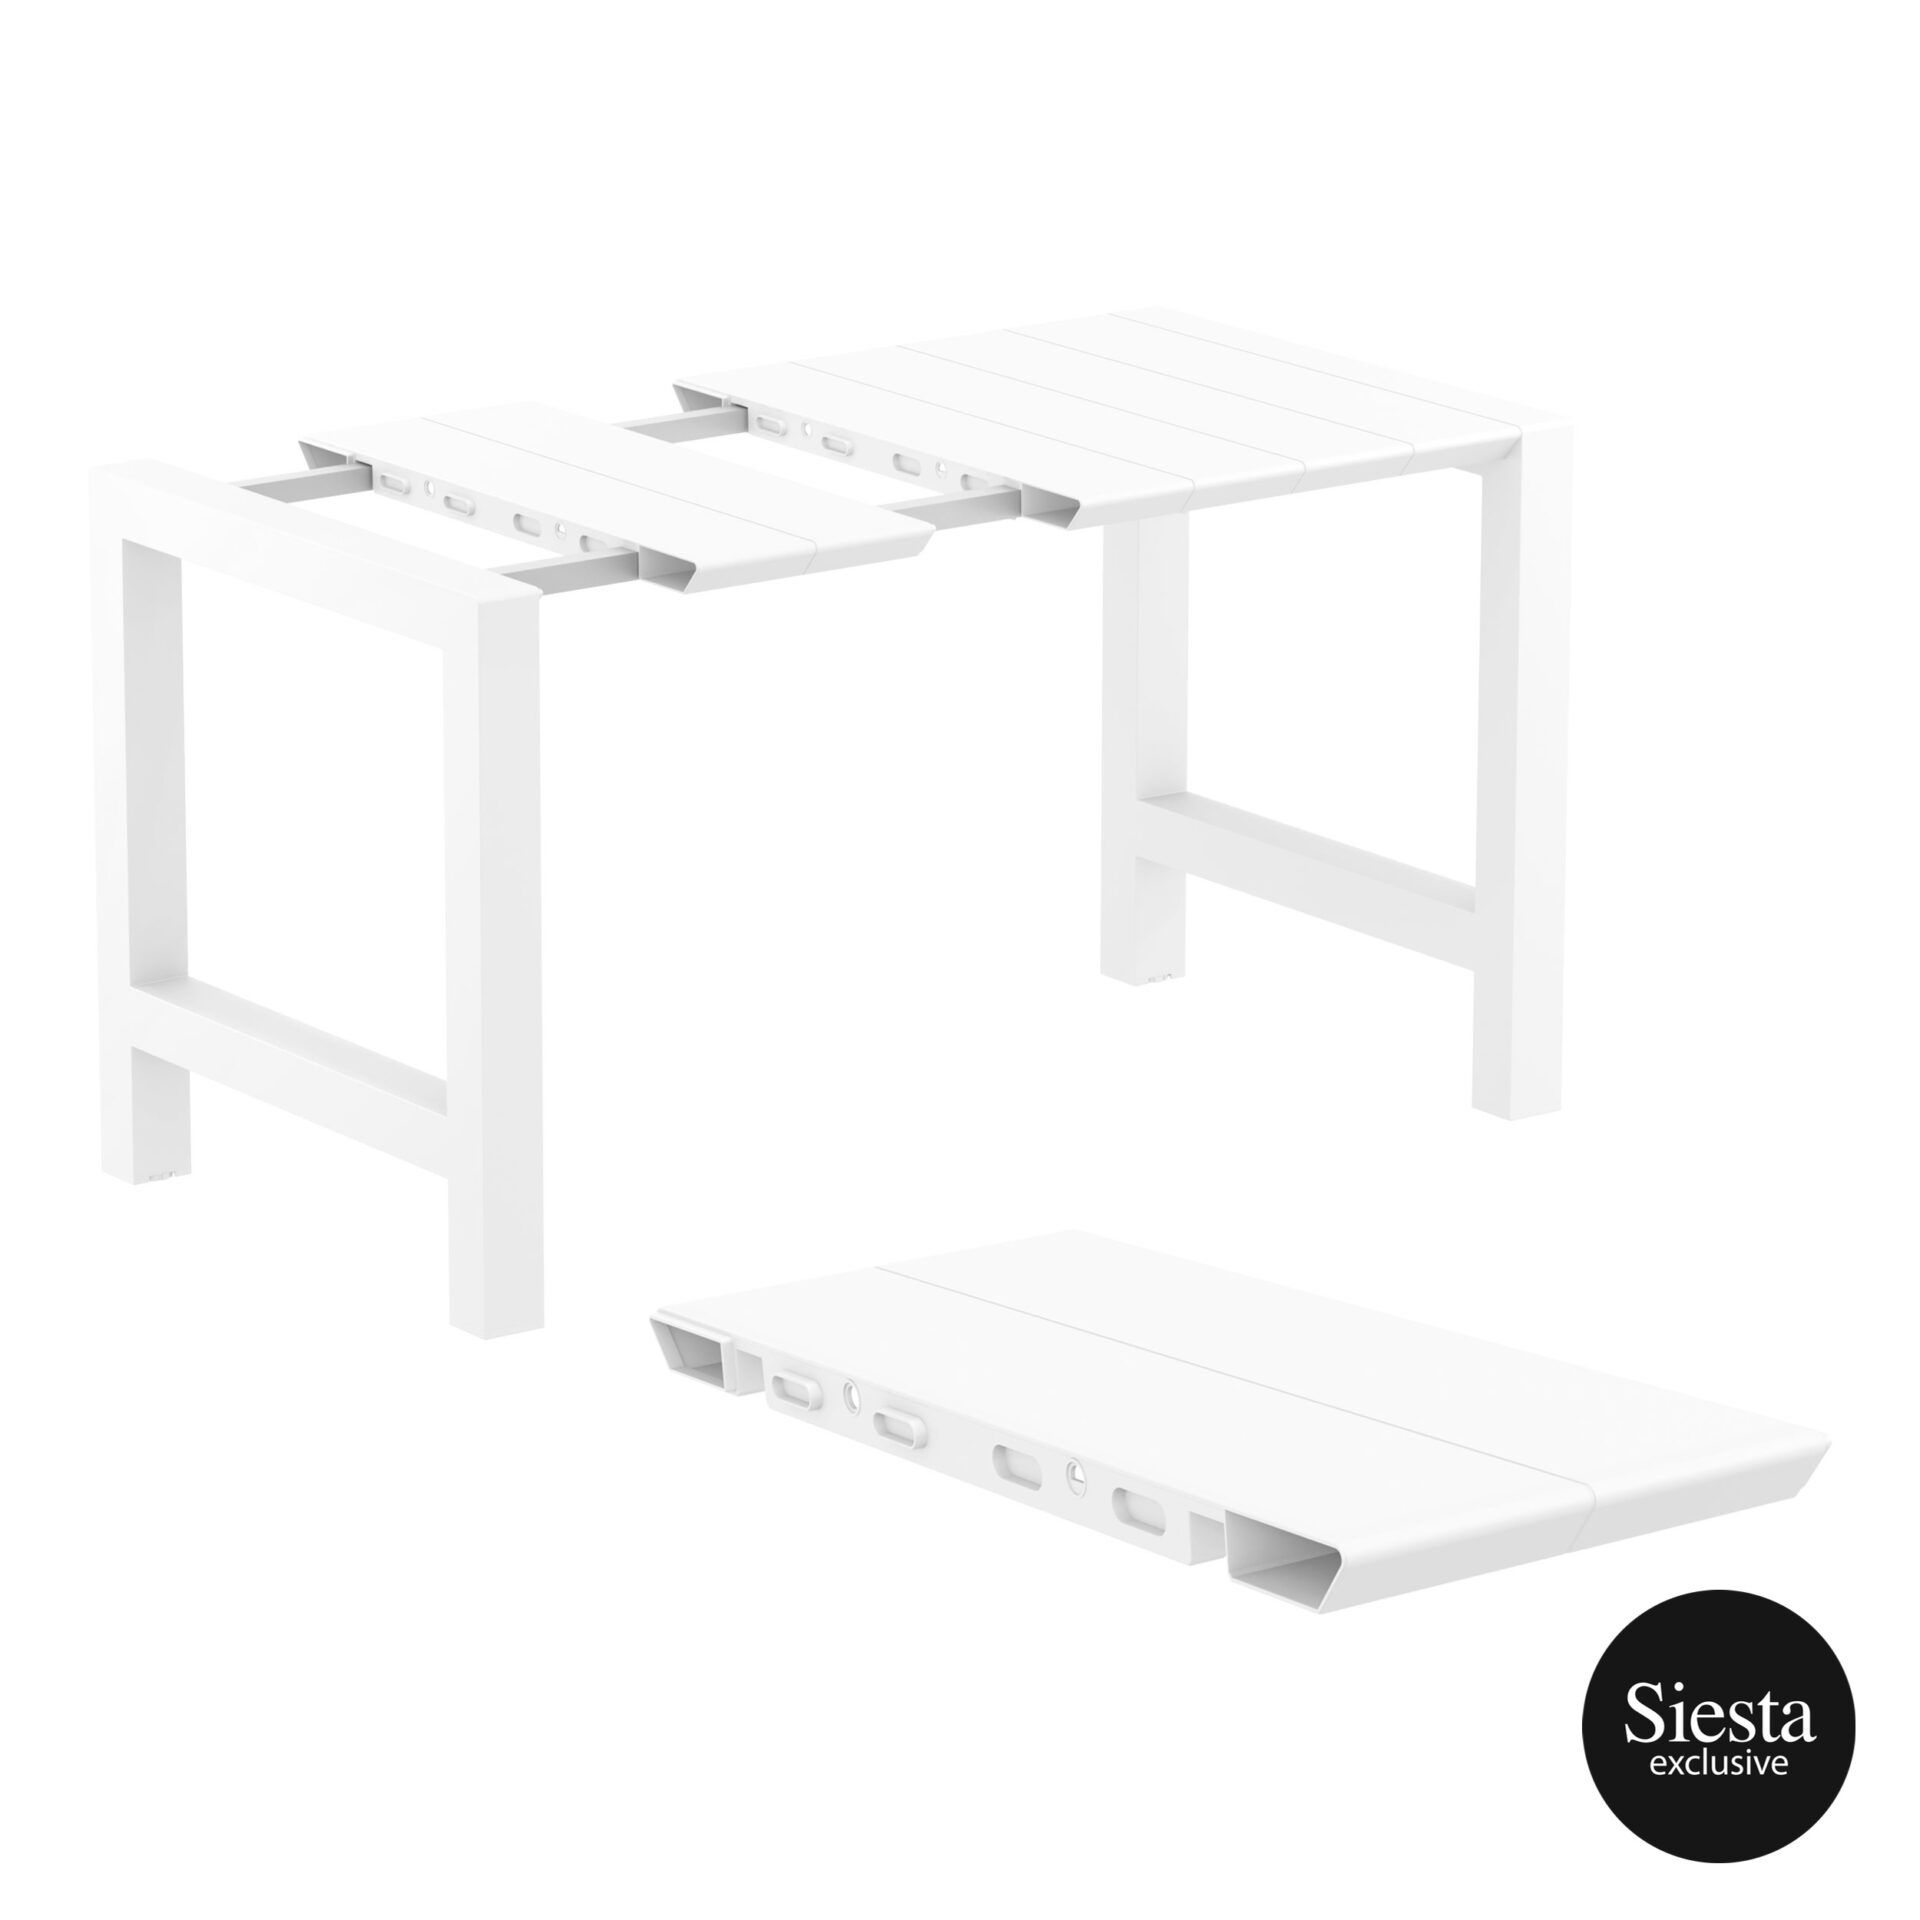 013 vegas bar table 140 white extension part